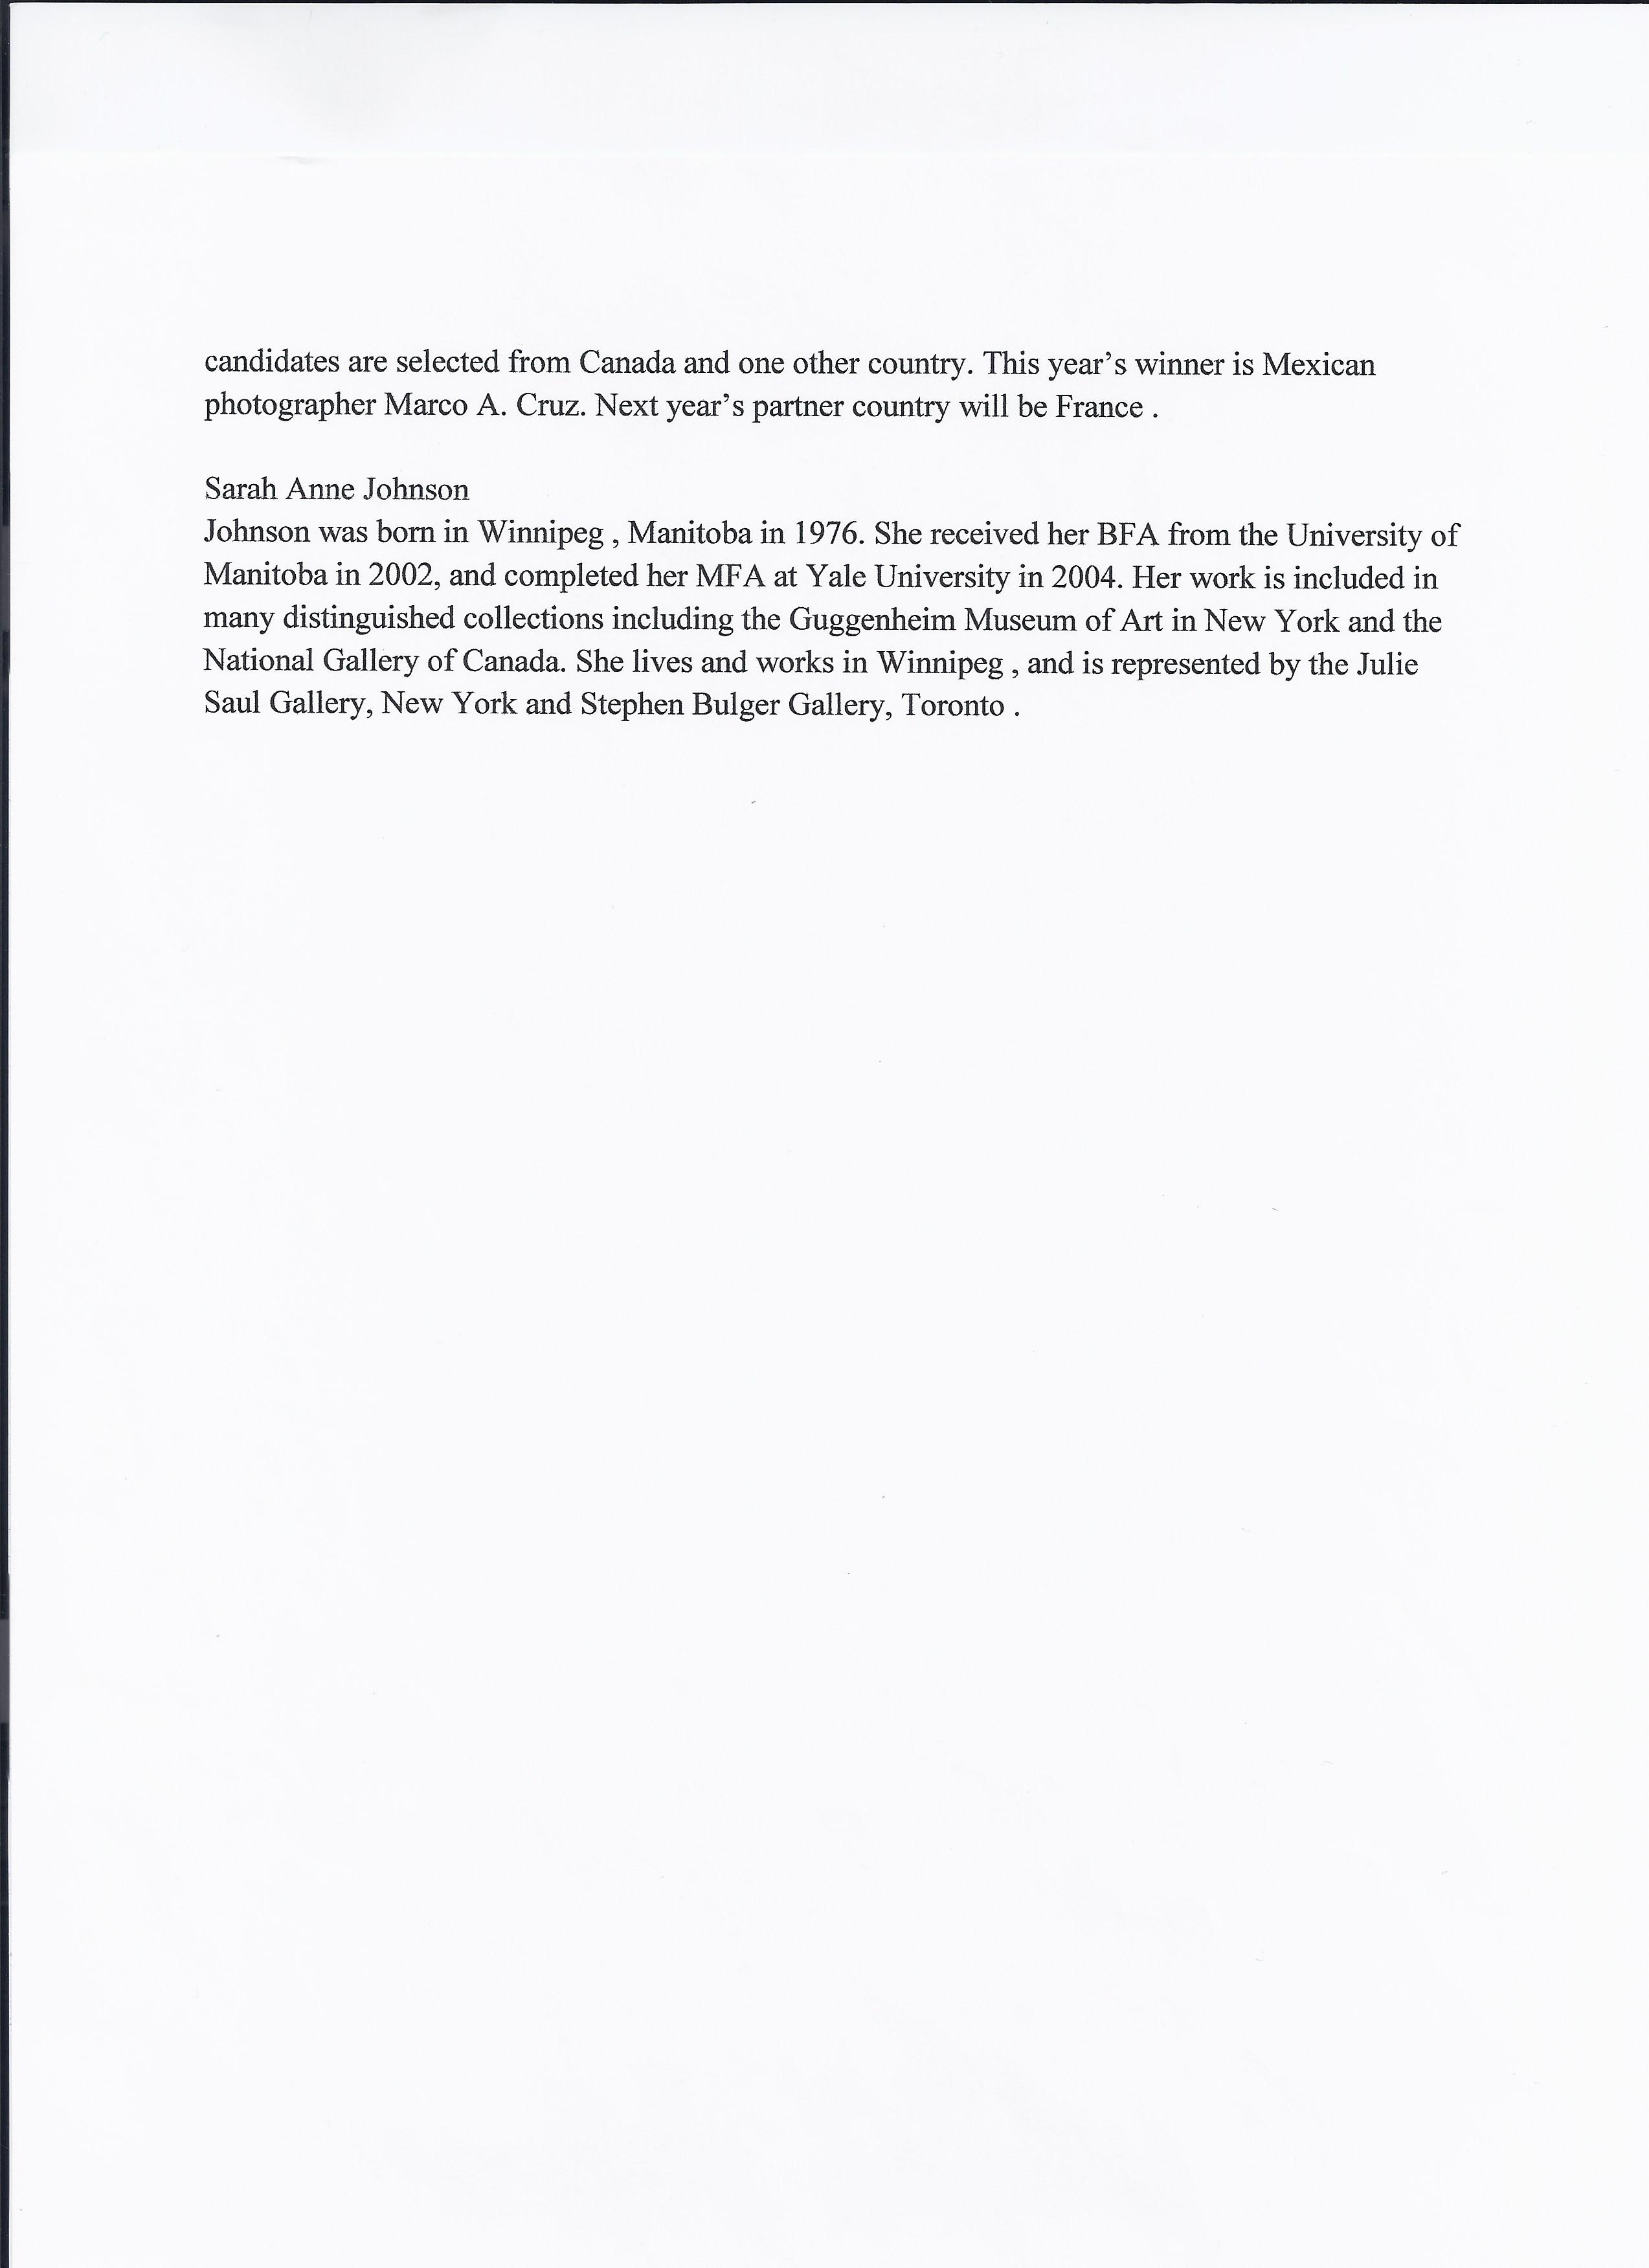 Buy dissertations online - COTRUGLI Business School distinguished ...